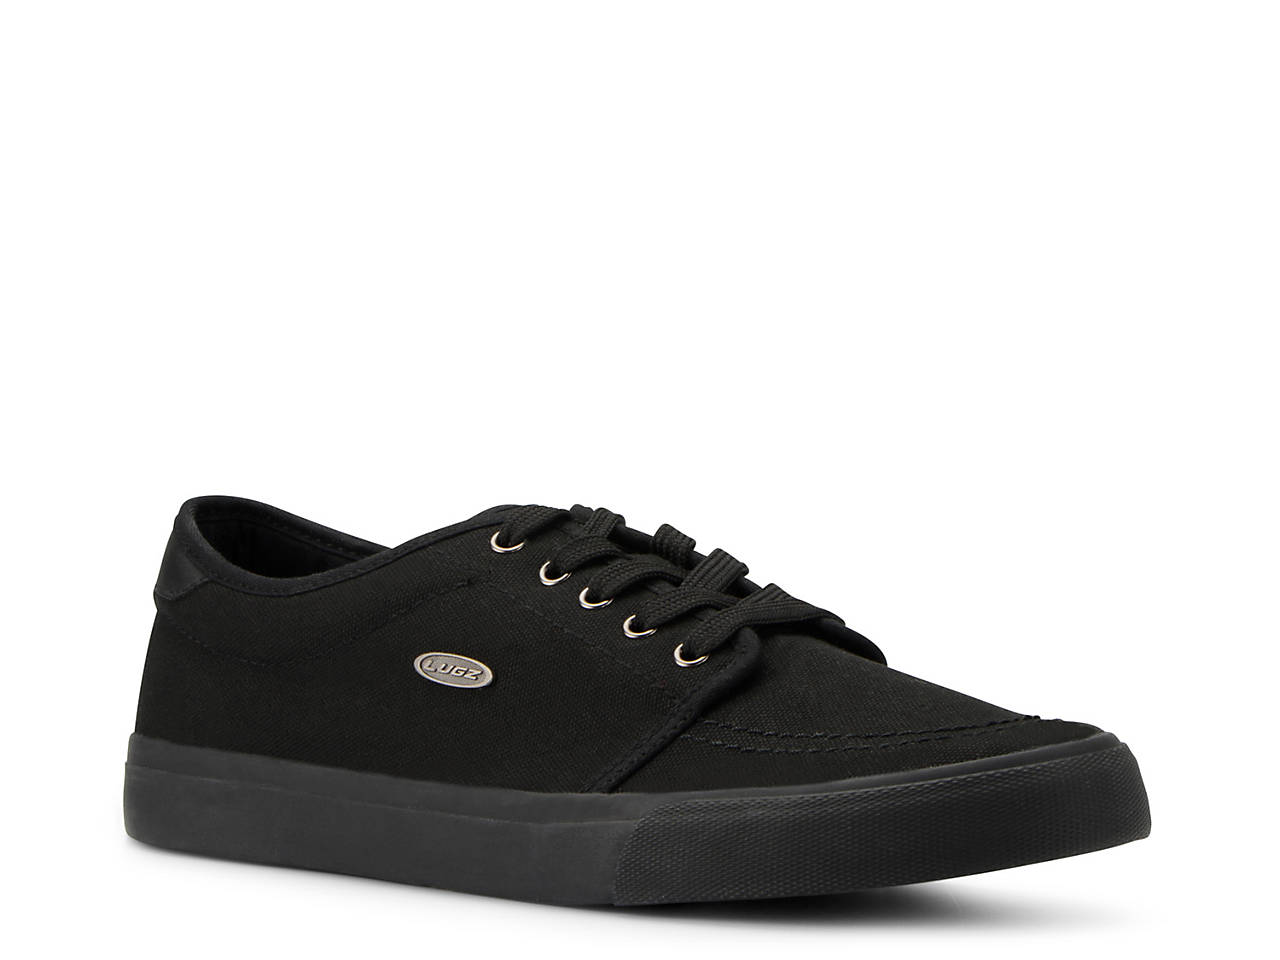 Lugz Rivington Men's Sneakers besMtR5r